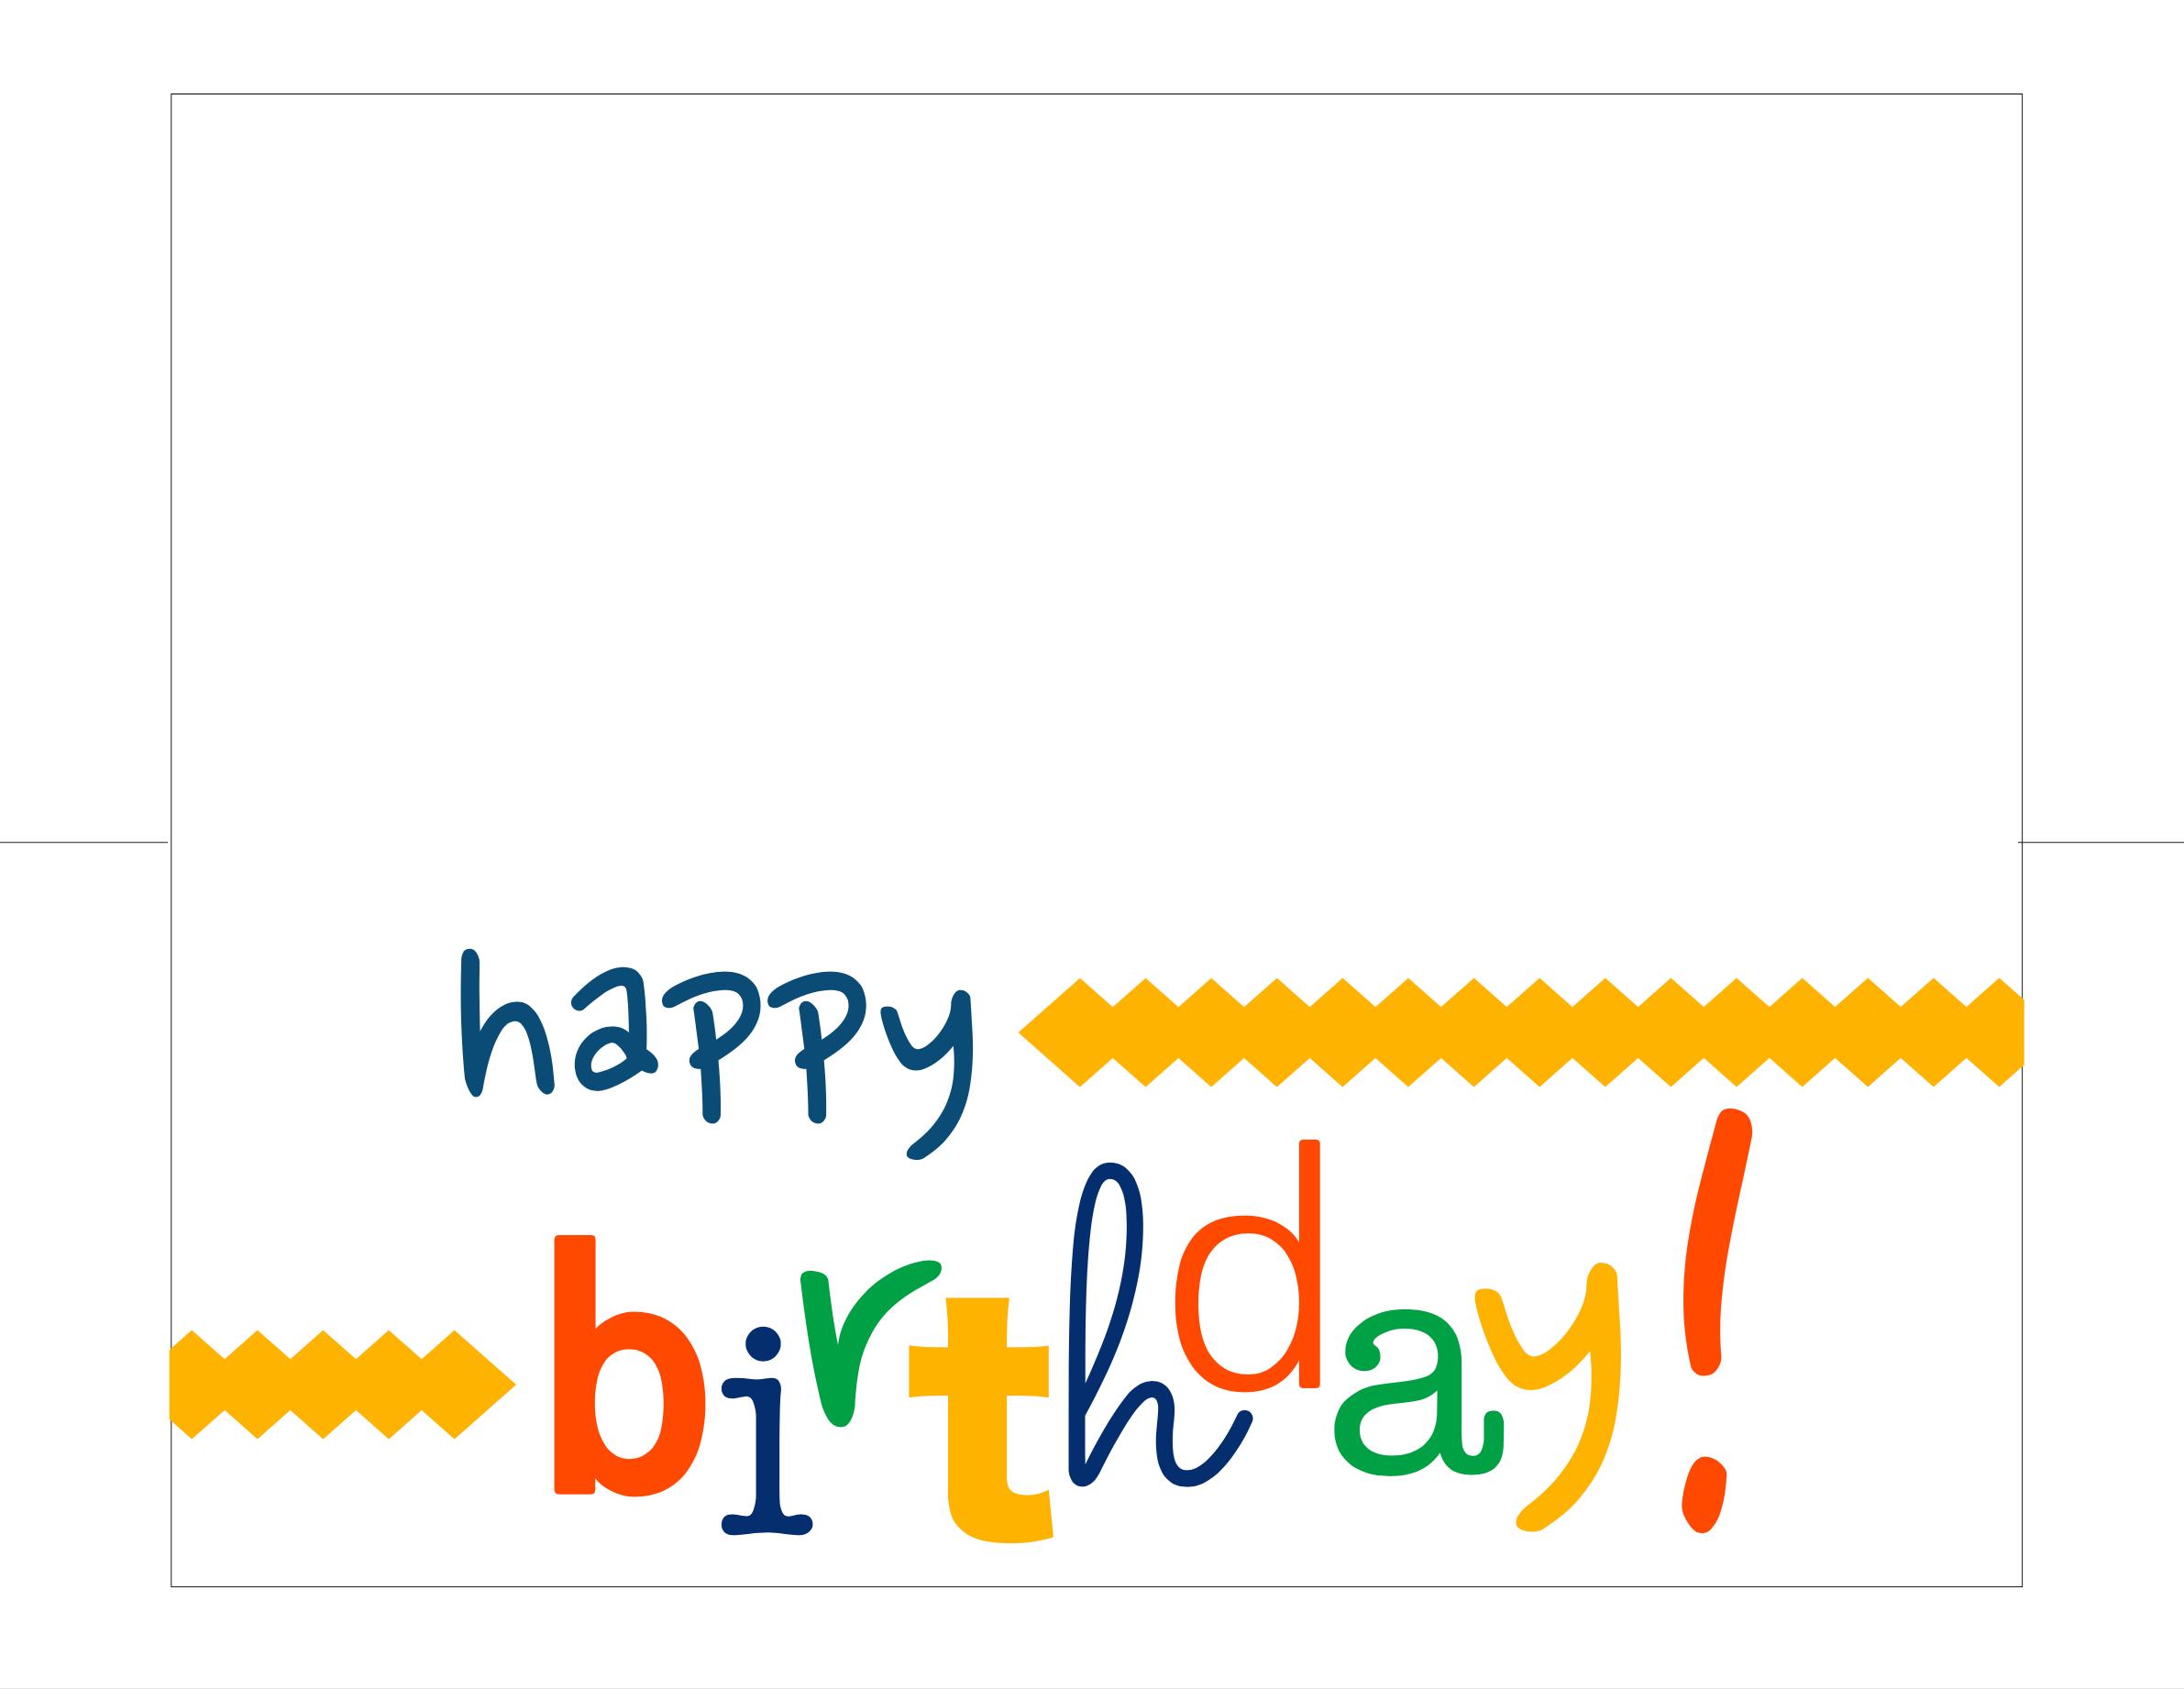 Happy Birthday Card Free Printable - - Free Printable Happy Birthday Cards